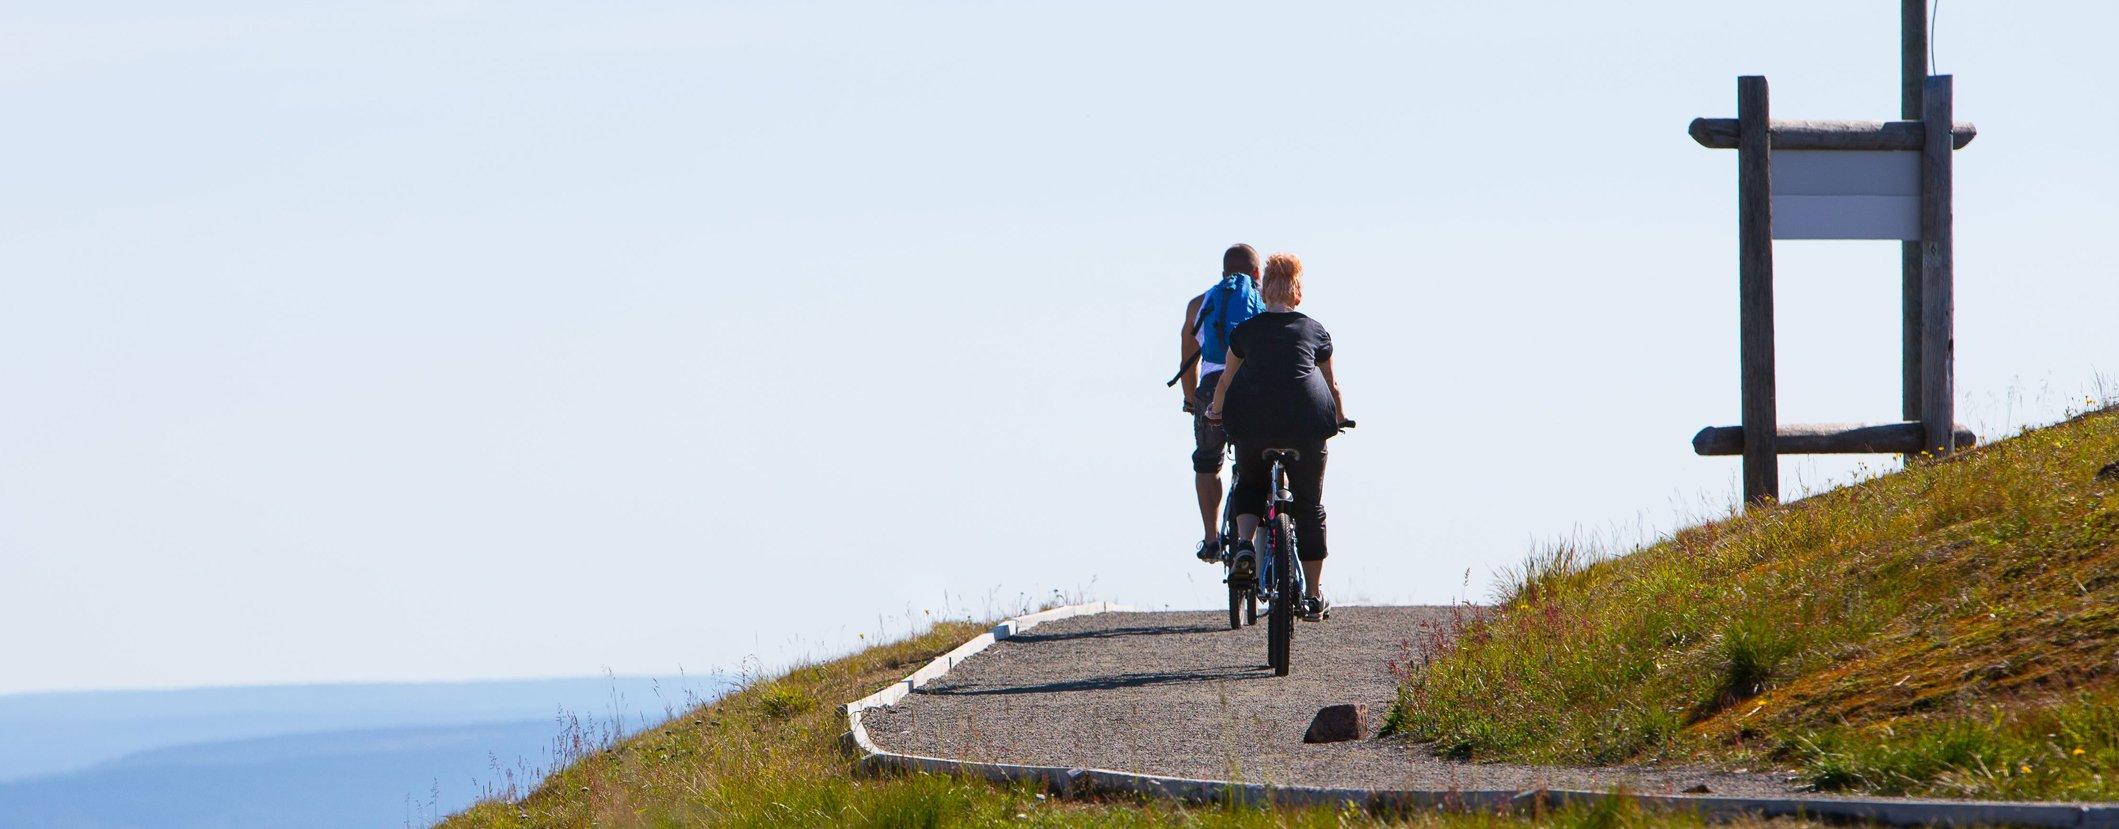 Levi_mountain_biking